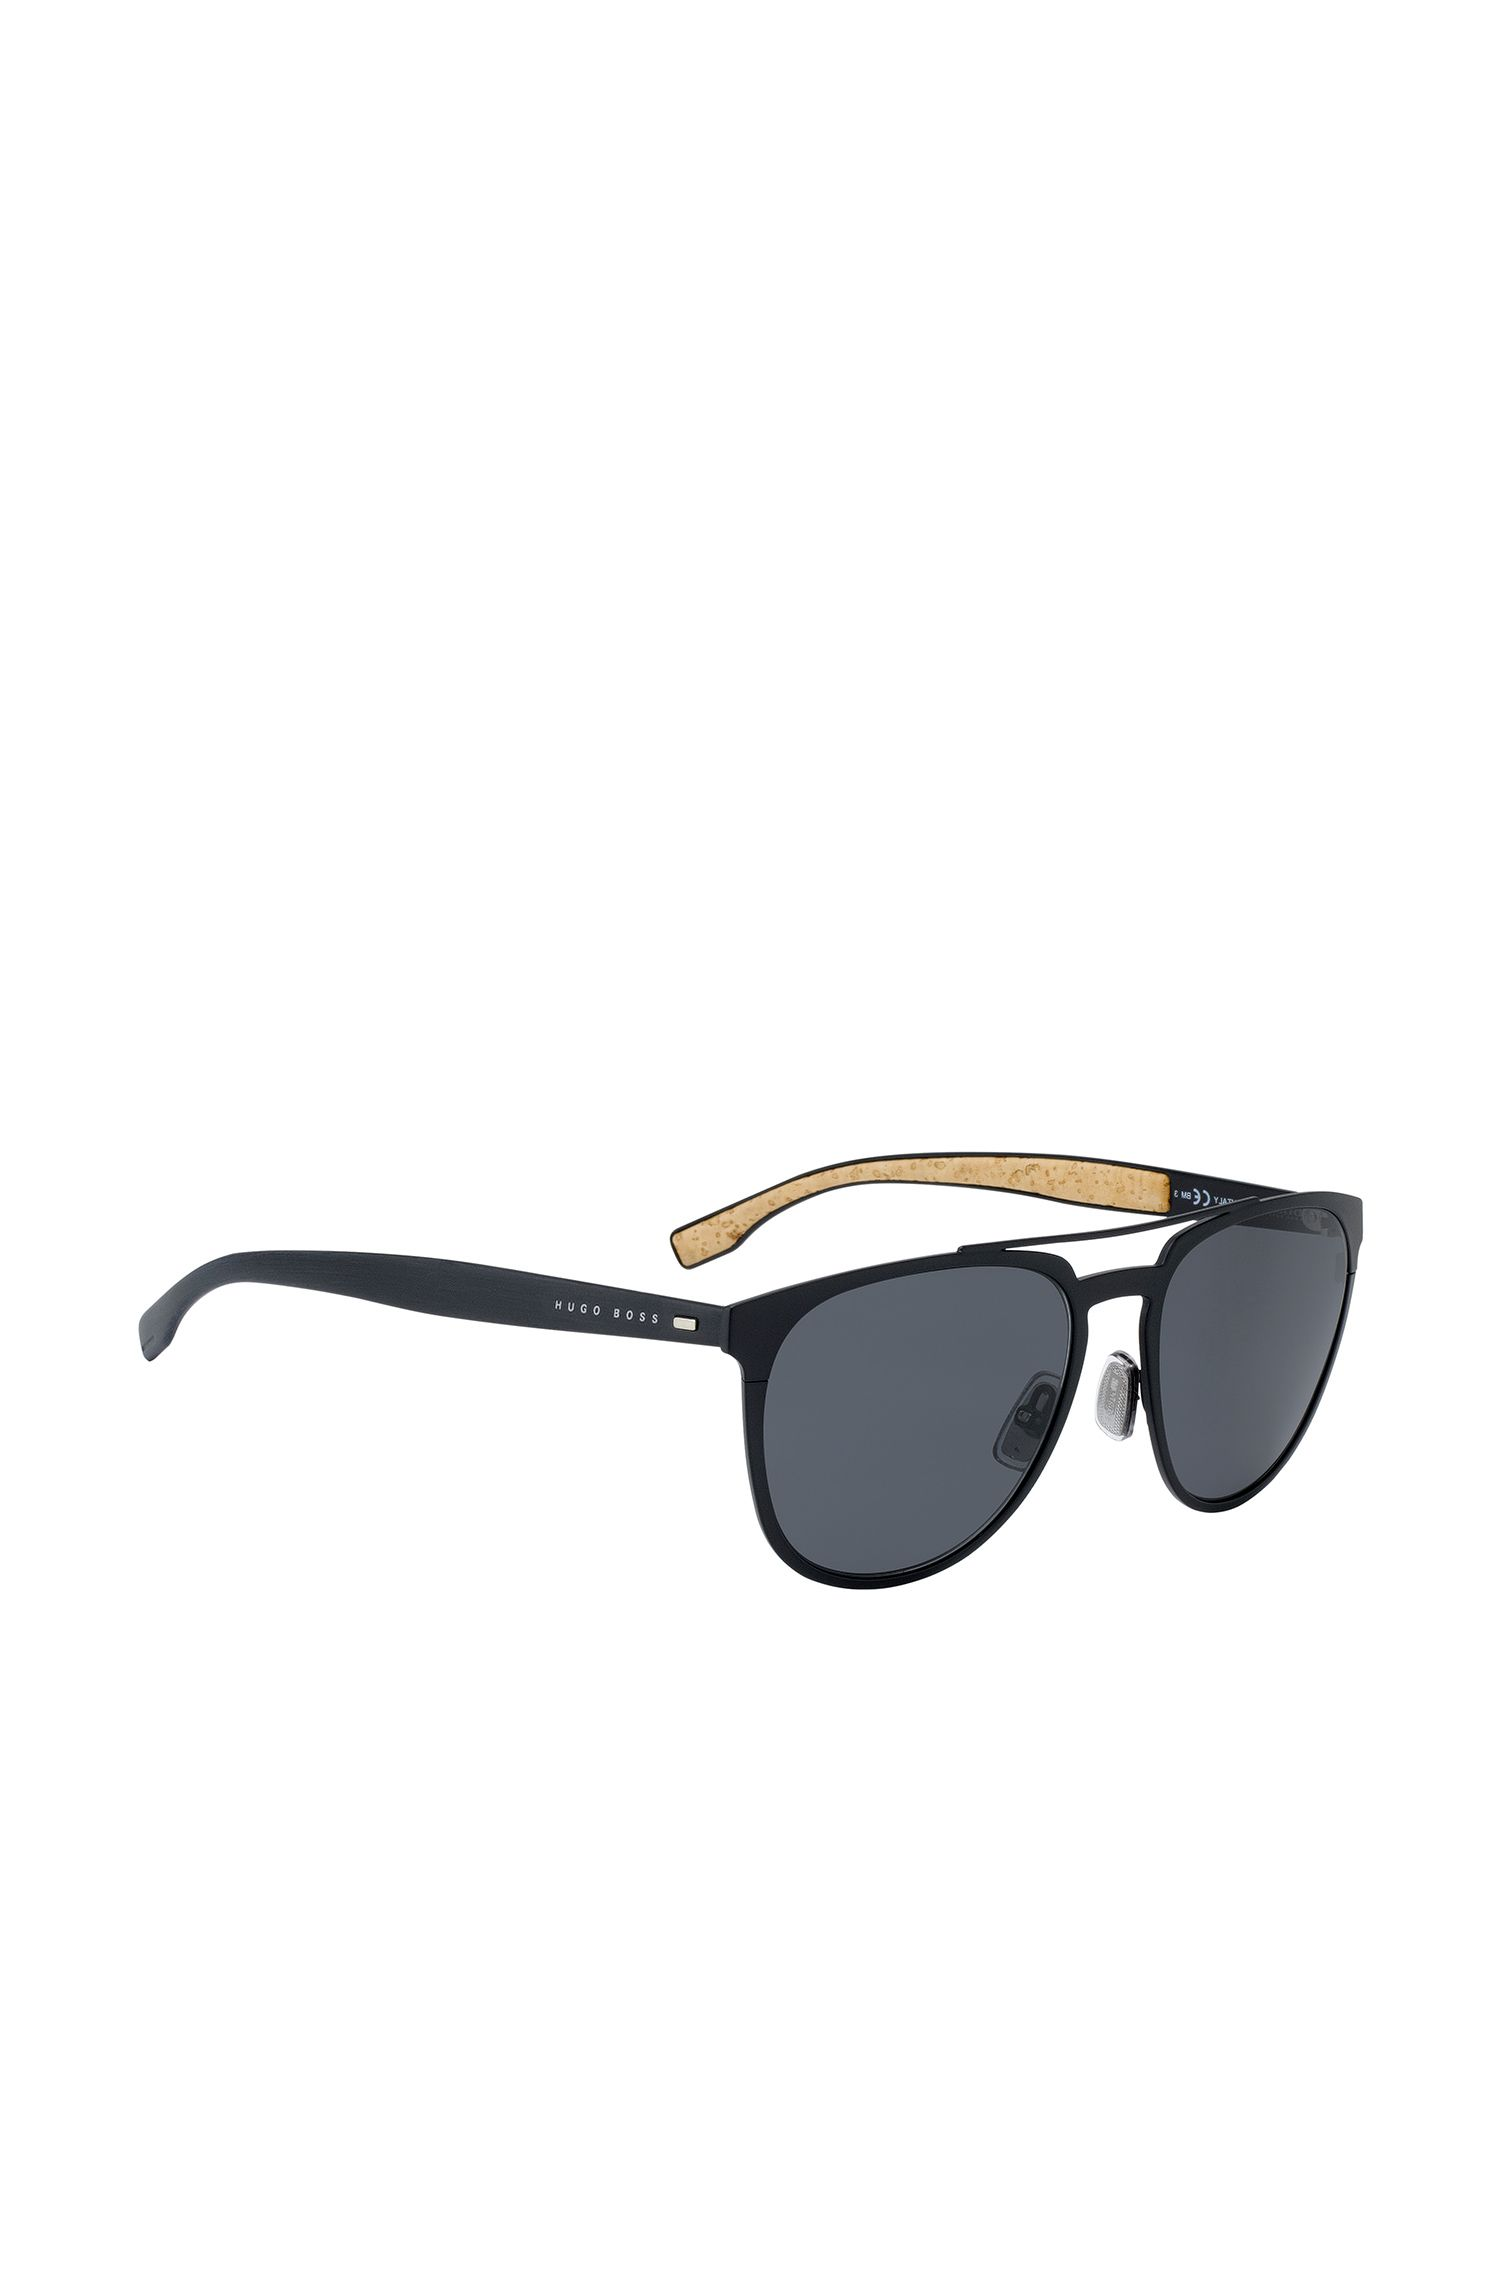 Sonnenbrille aus Metall mit Korkbesatz: 'BOSS 0882/S'